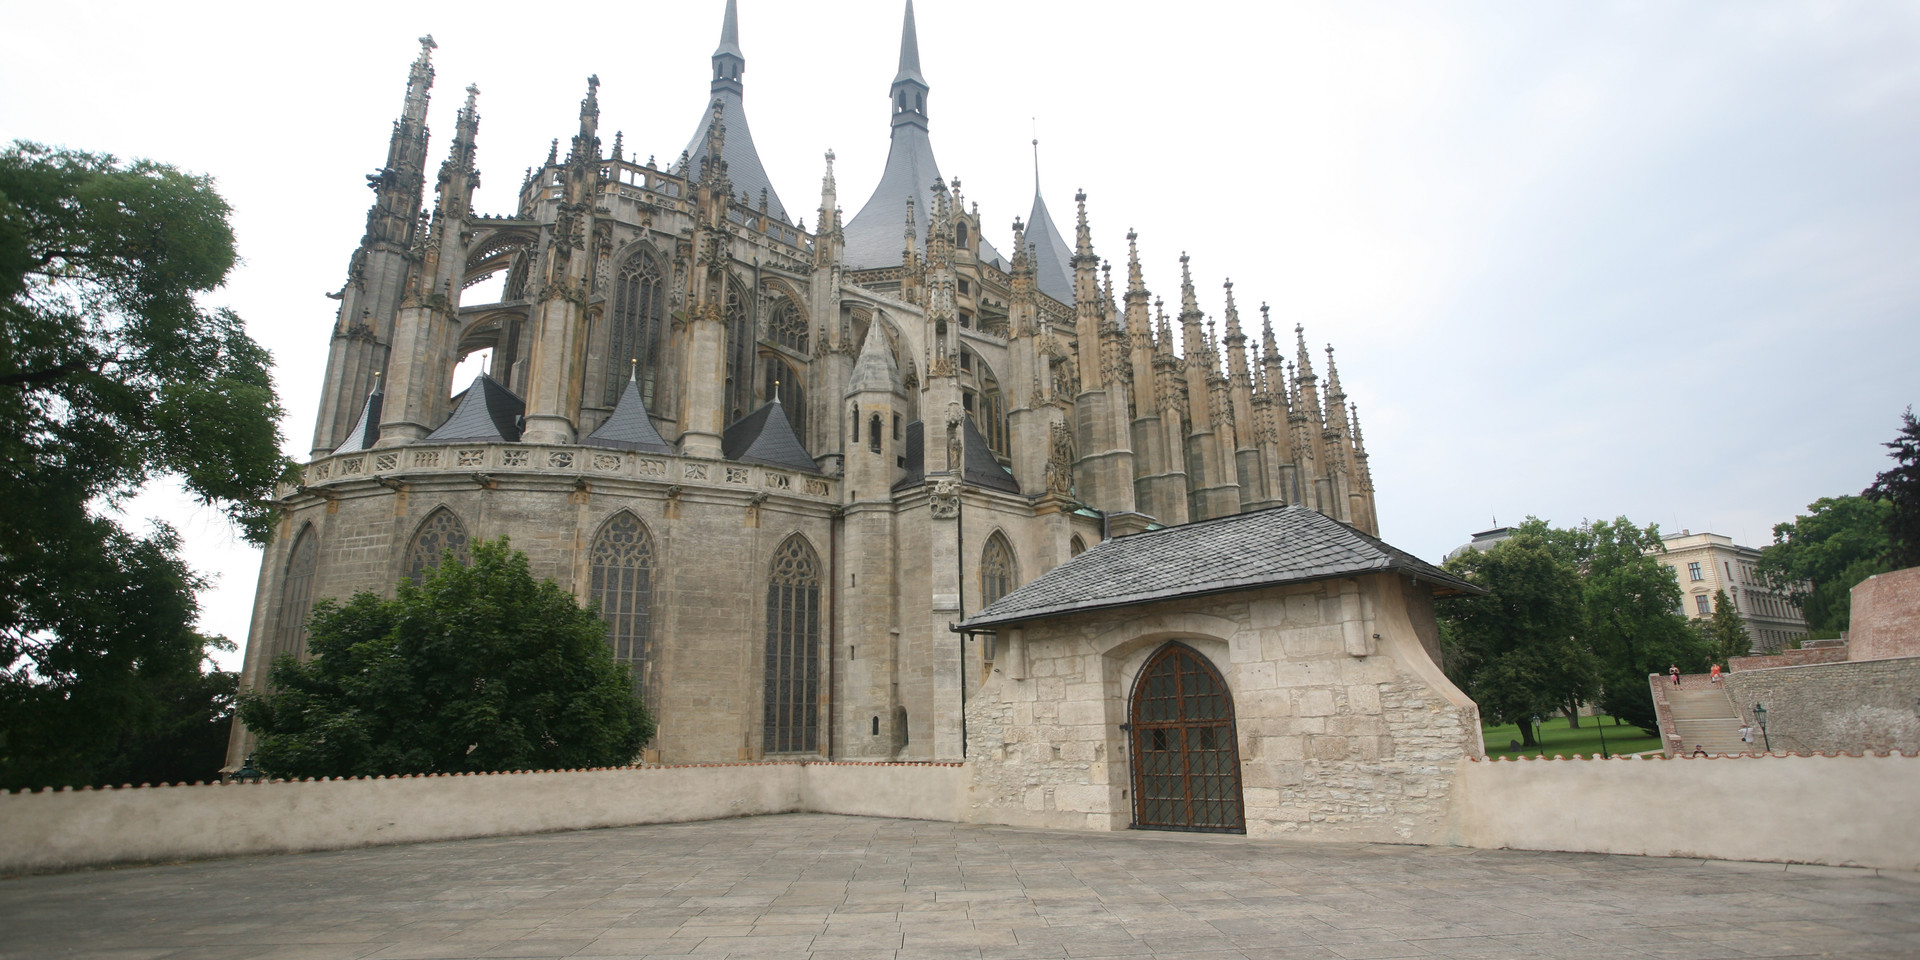 Sint-Barbara church